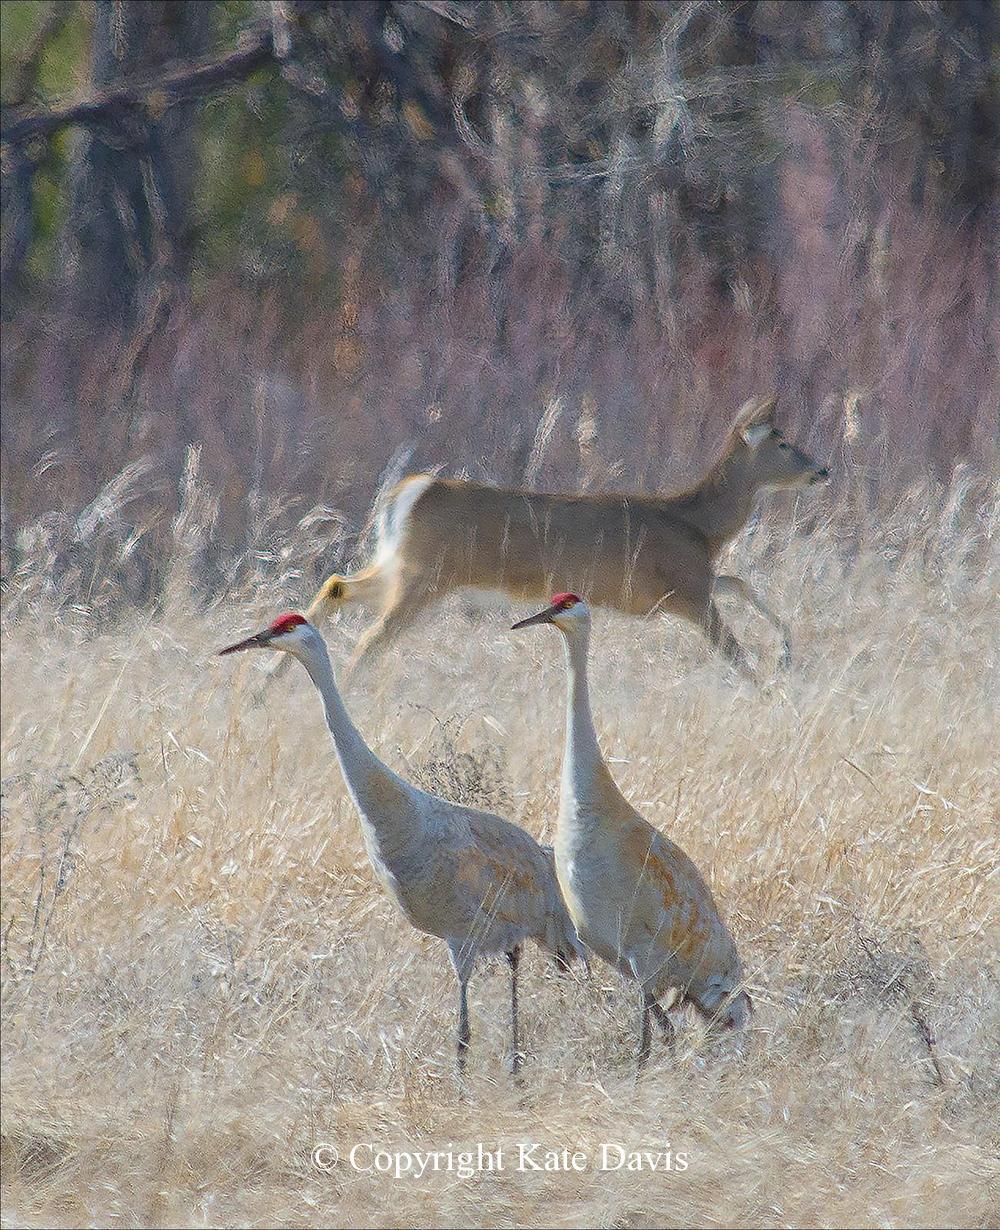 Song Bird Photos - Sandhill Cranes - Shore Bird Photos - Sandhill Cranes/White-tail Deer at Lee Metcalf refuge in the summer